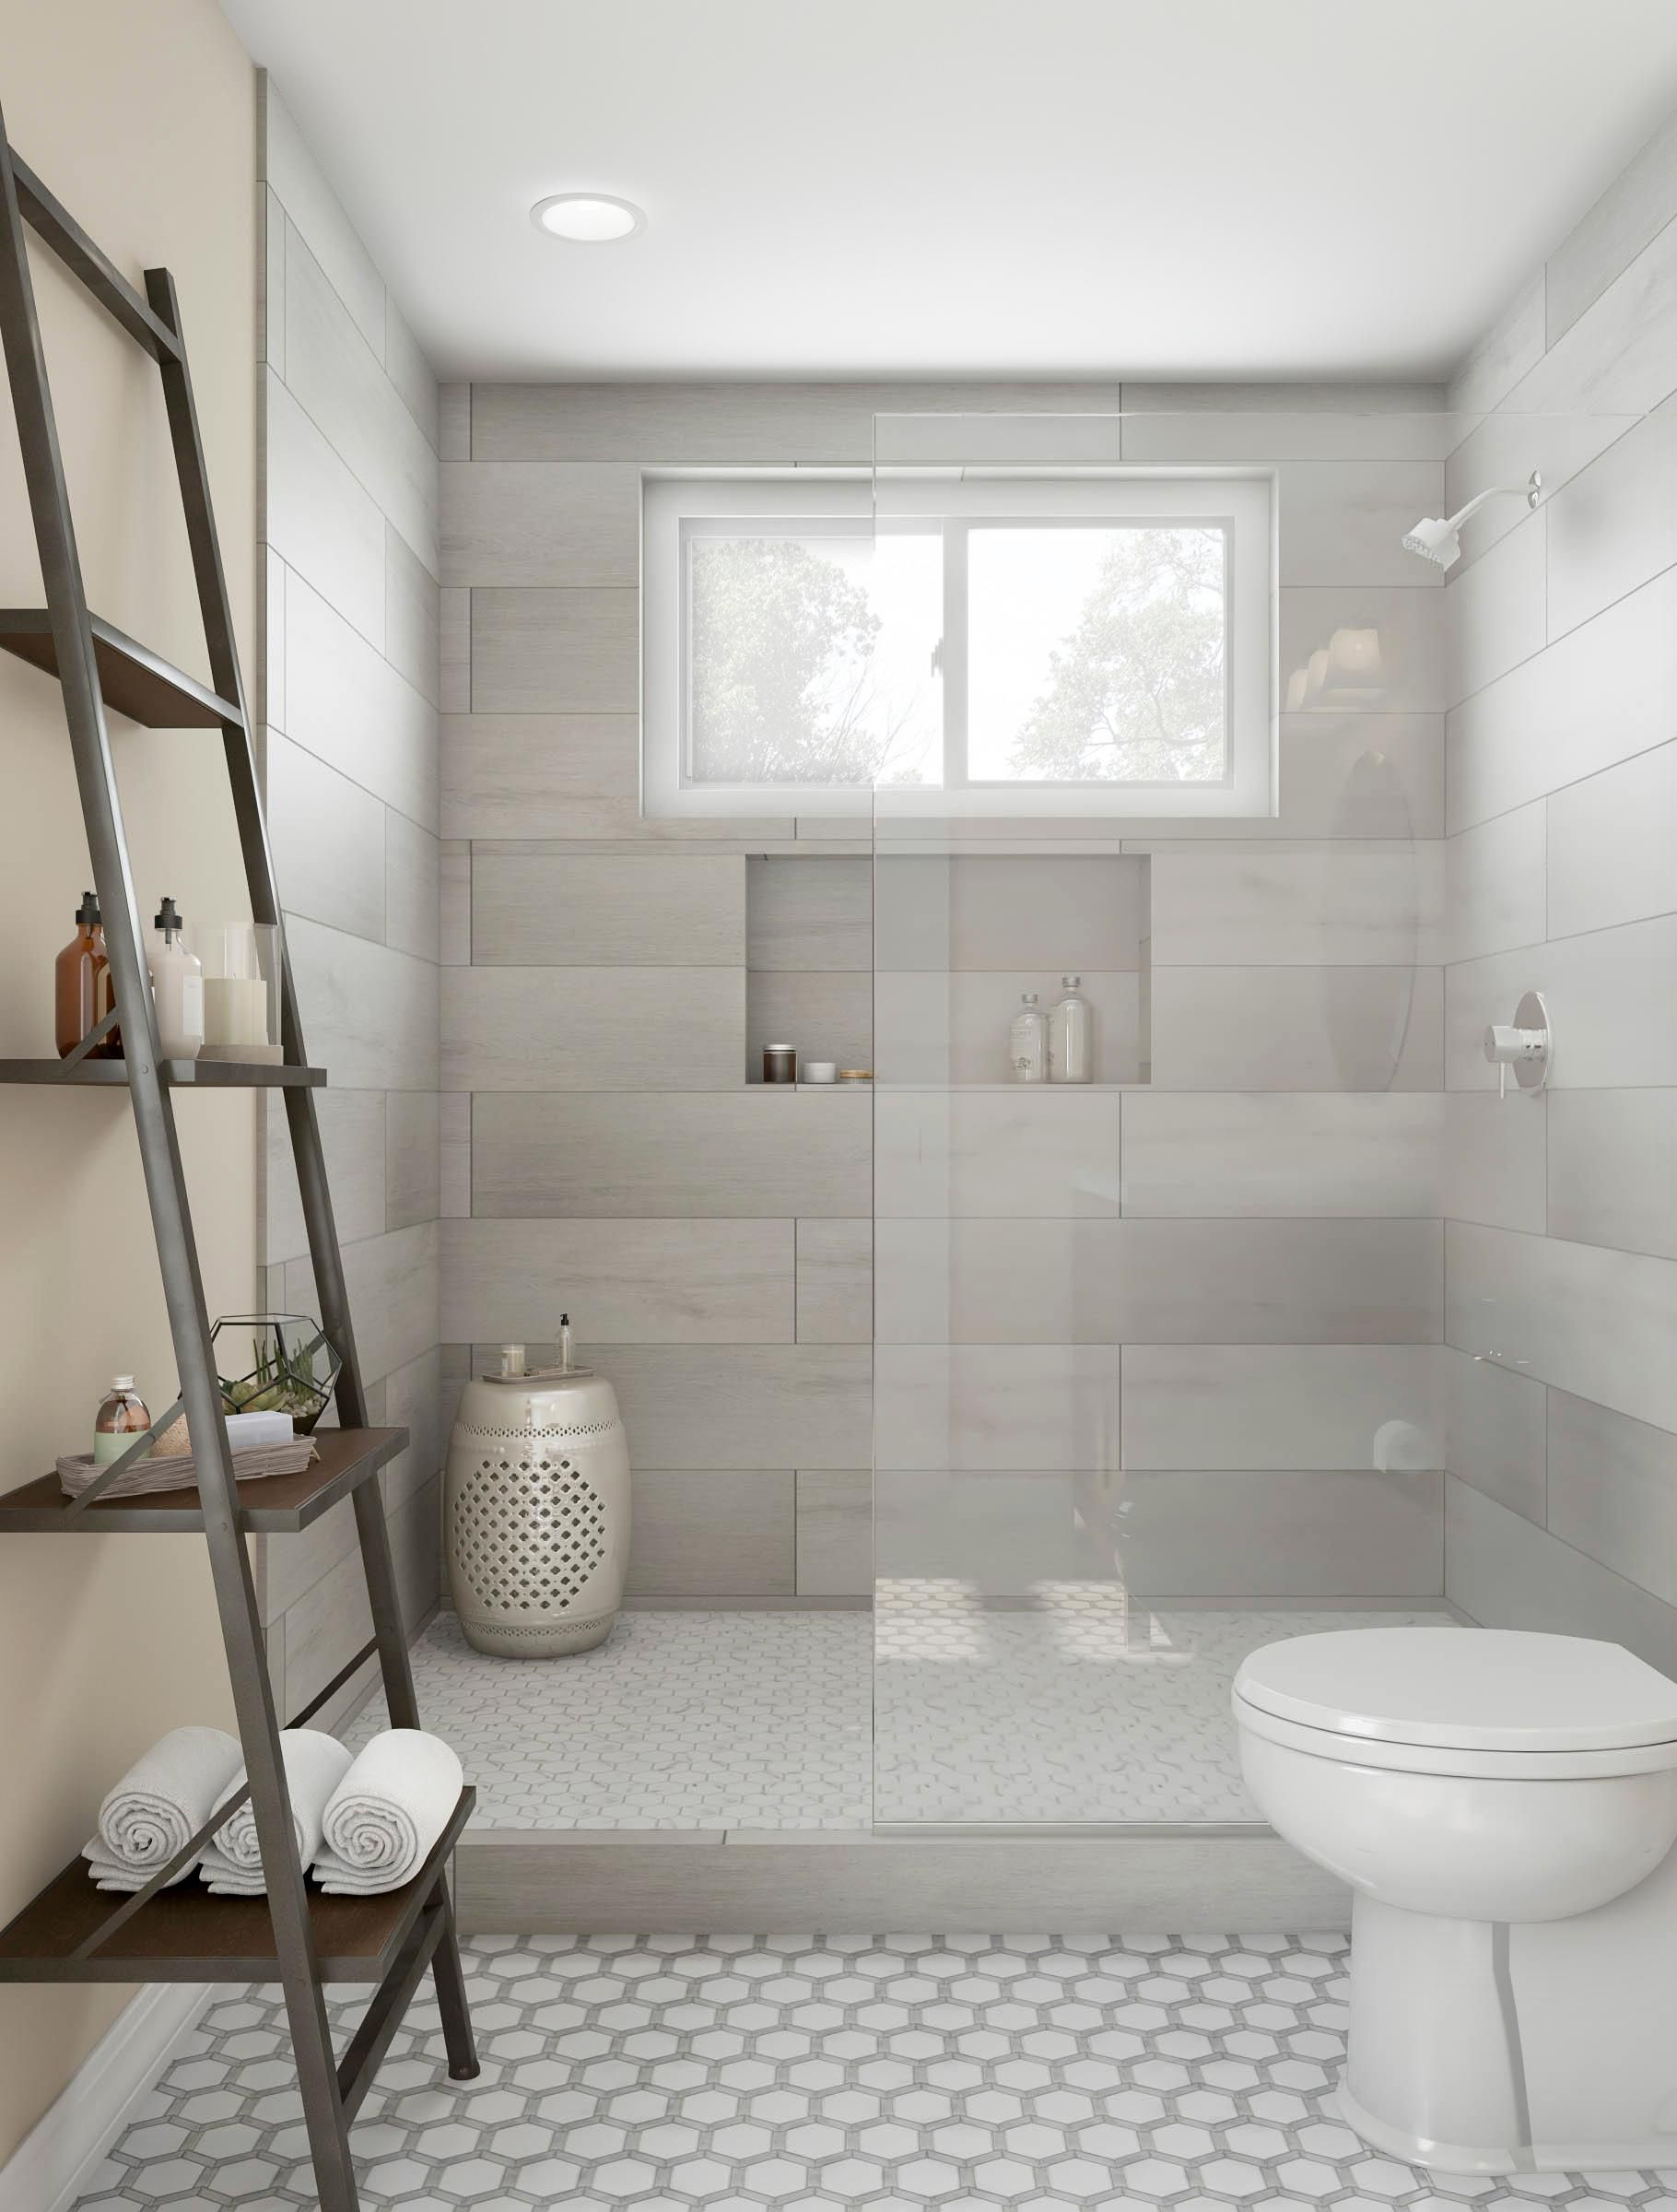 Ash Gradient Walk In Spa Shower Bathroom Remodel Shower Master Bathroom Shower Bathrooms Remodel Half tiled bathroom window